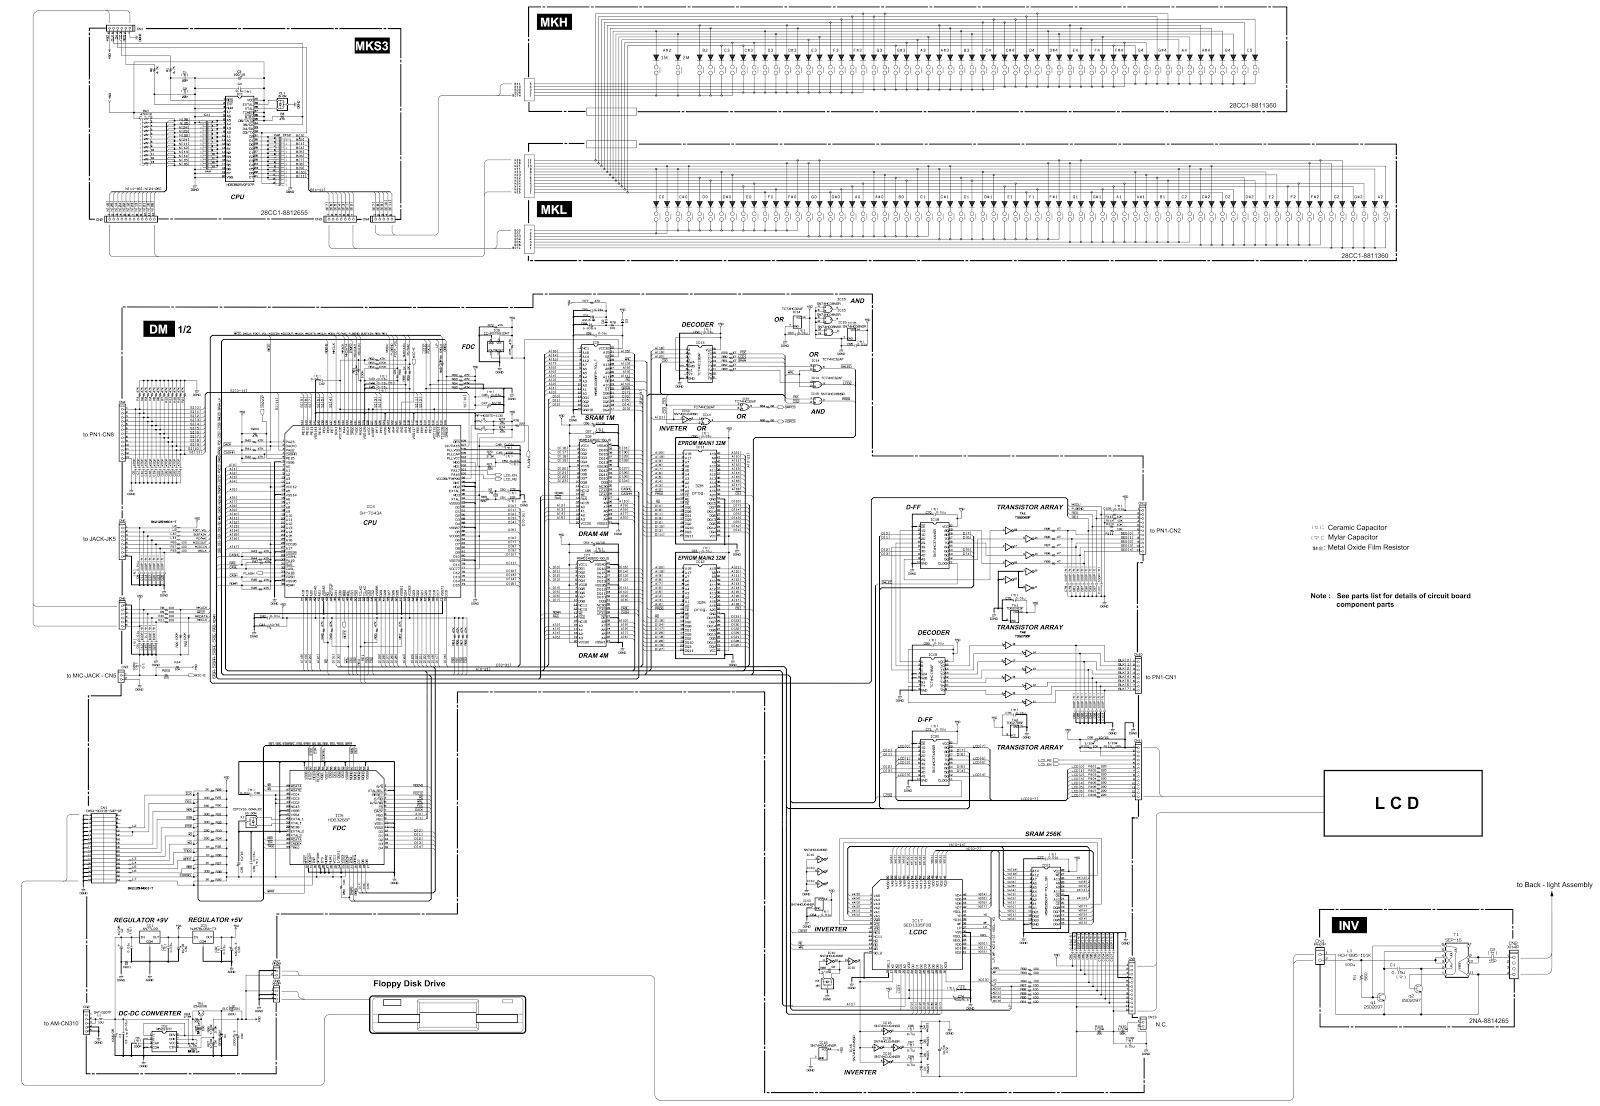 medium resolution of yamaha keyboard wiring diagram somurich com yamaha steering diagram yamaha keyboard wiring diagram